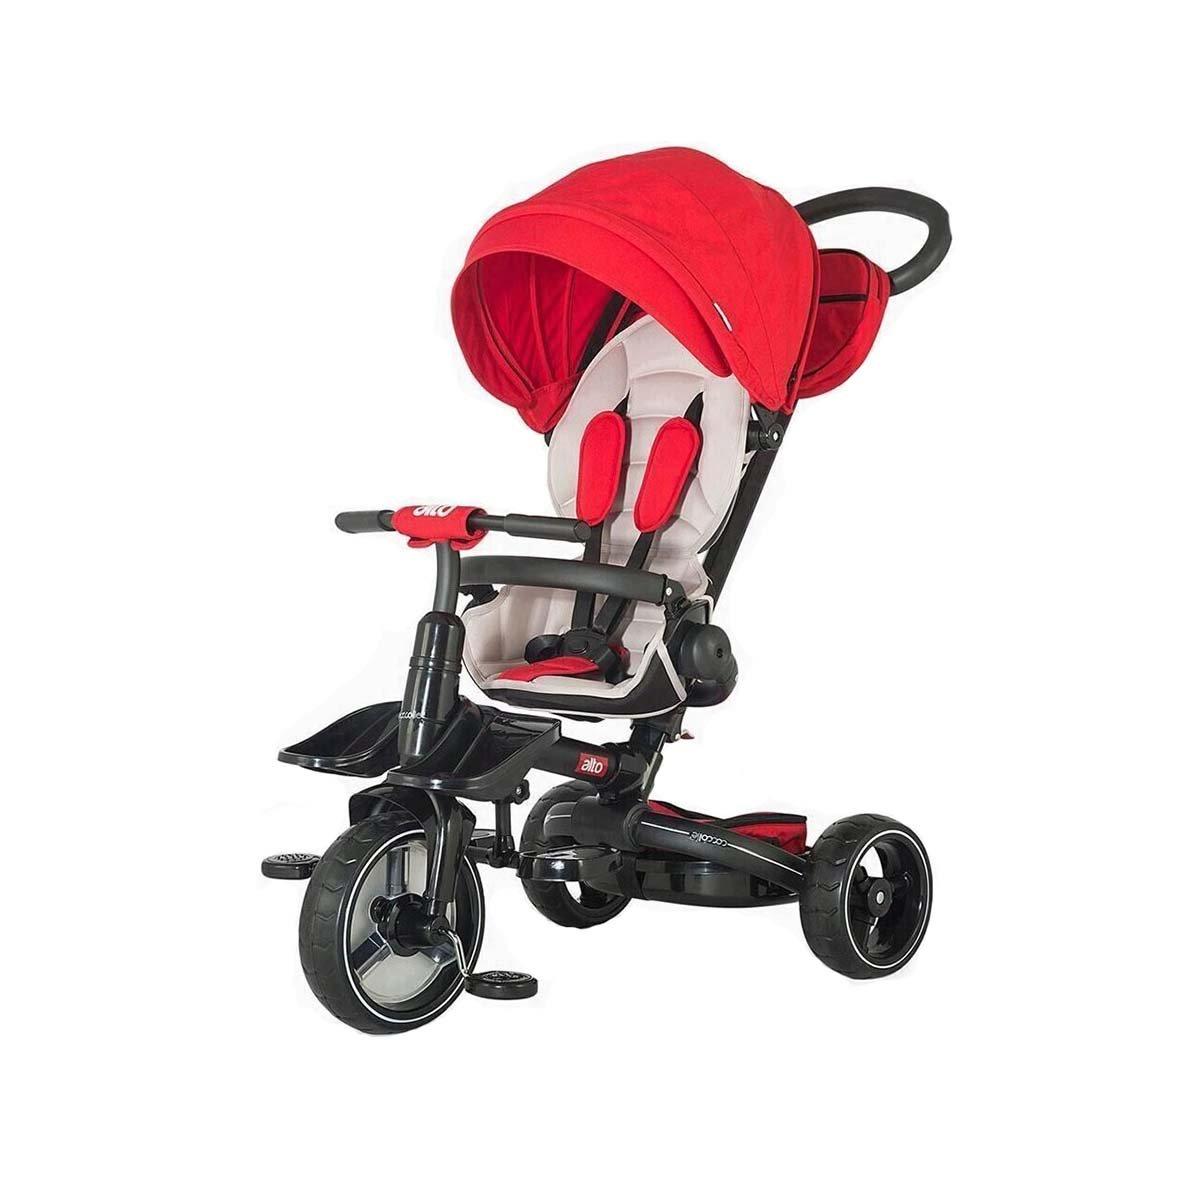 Tricicleta multifunctionala Alto Coccolle, Rosu imagine